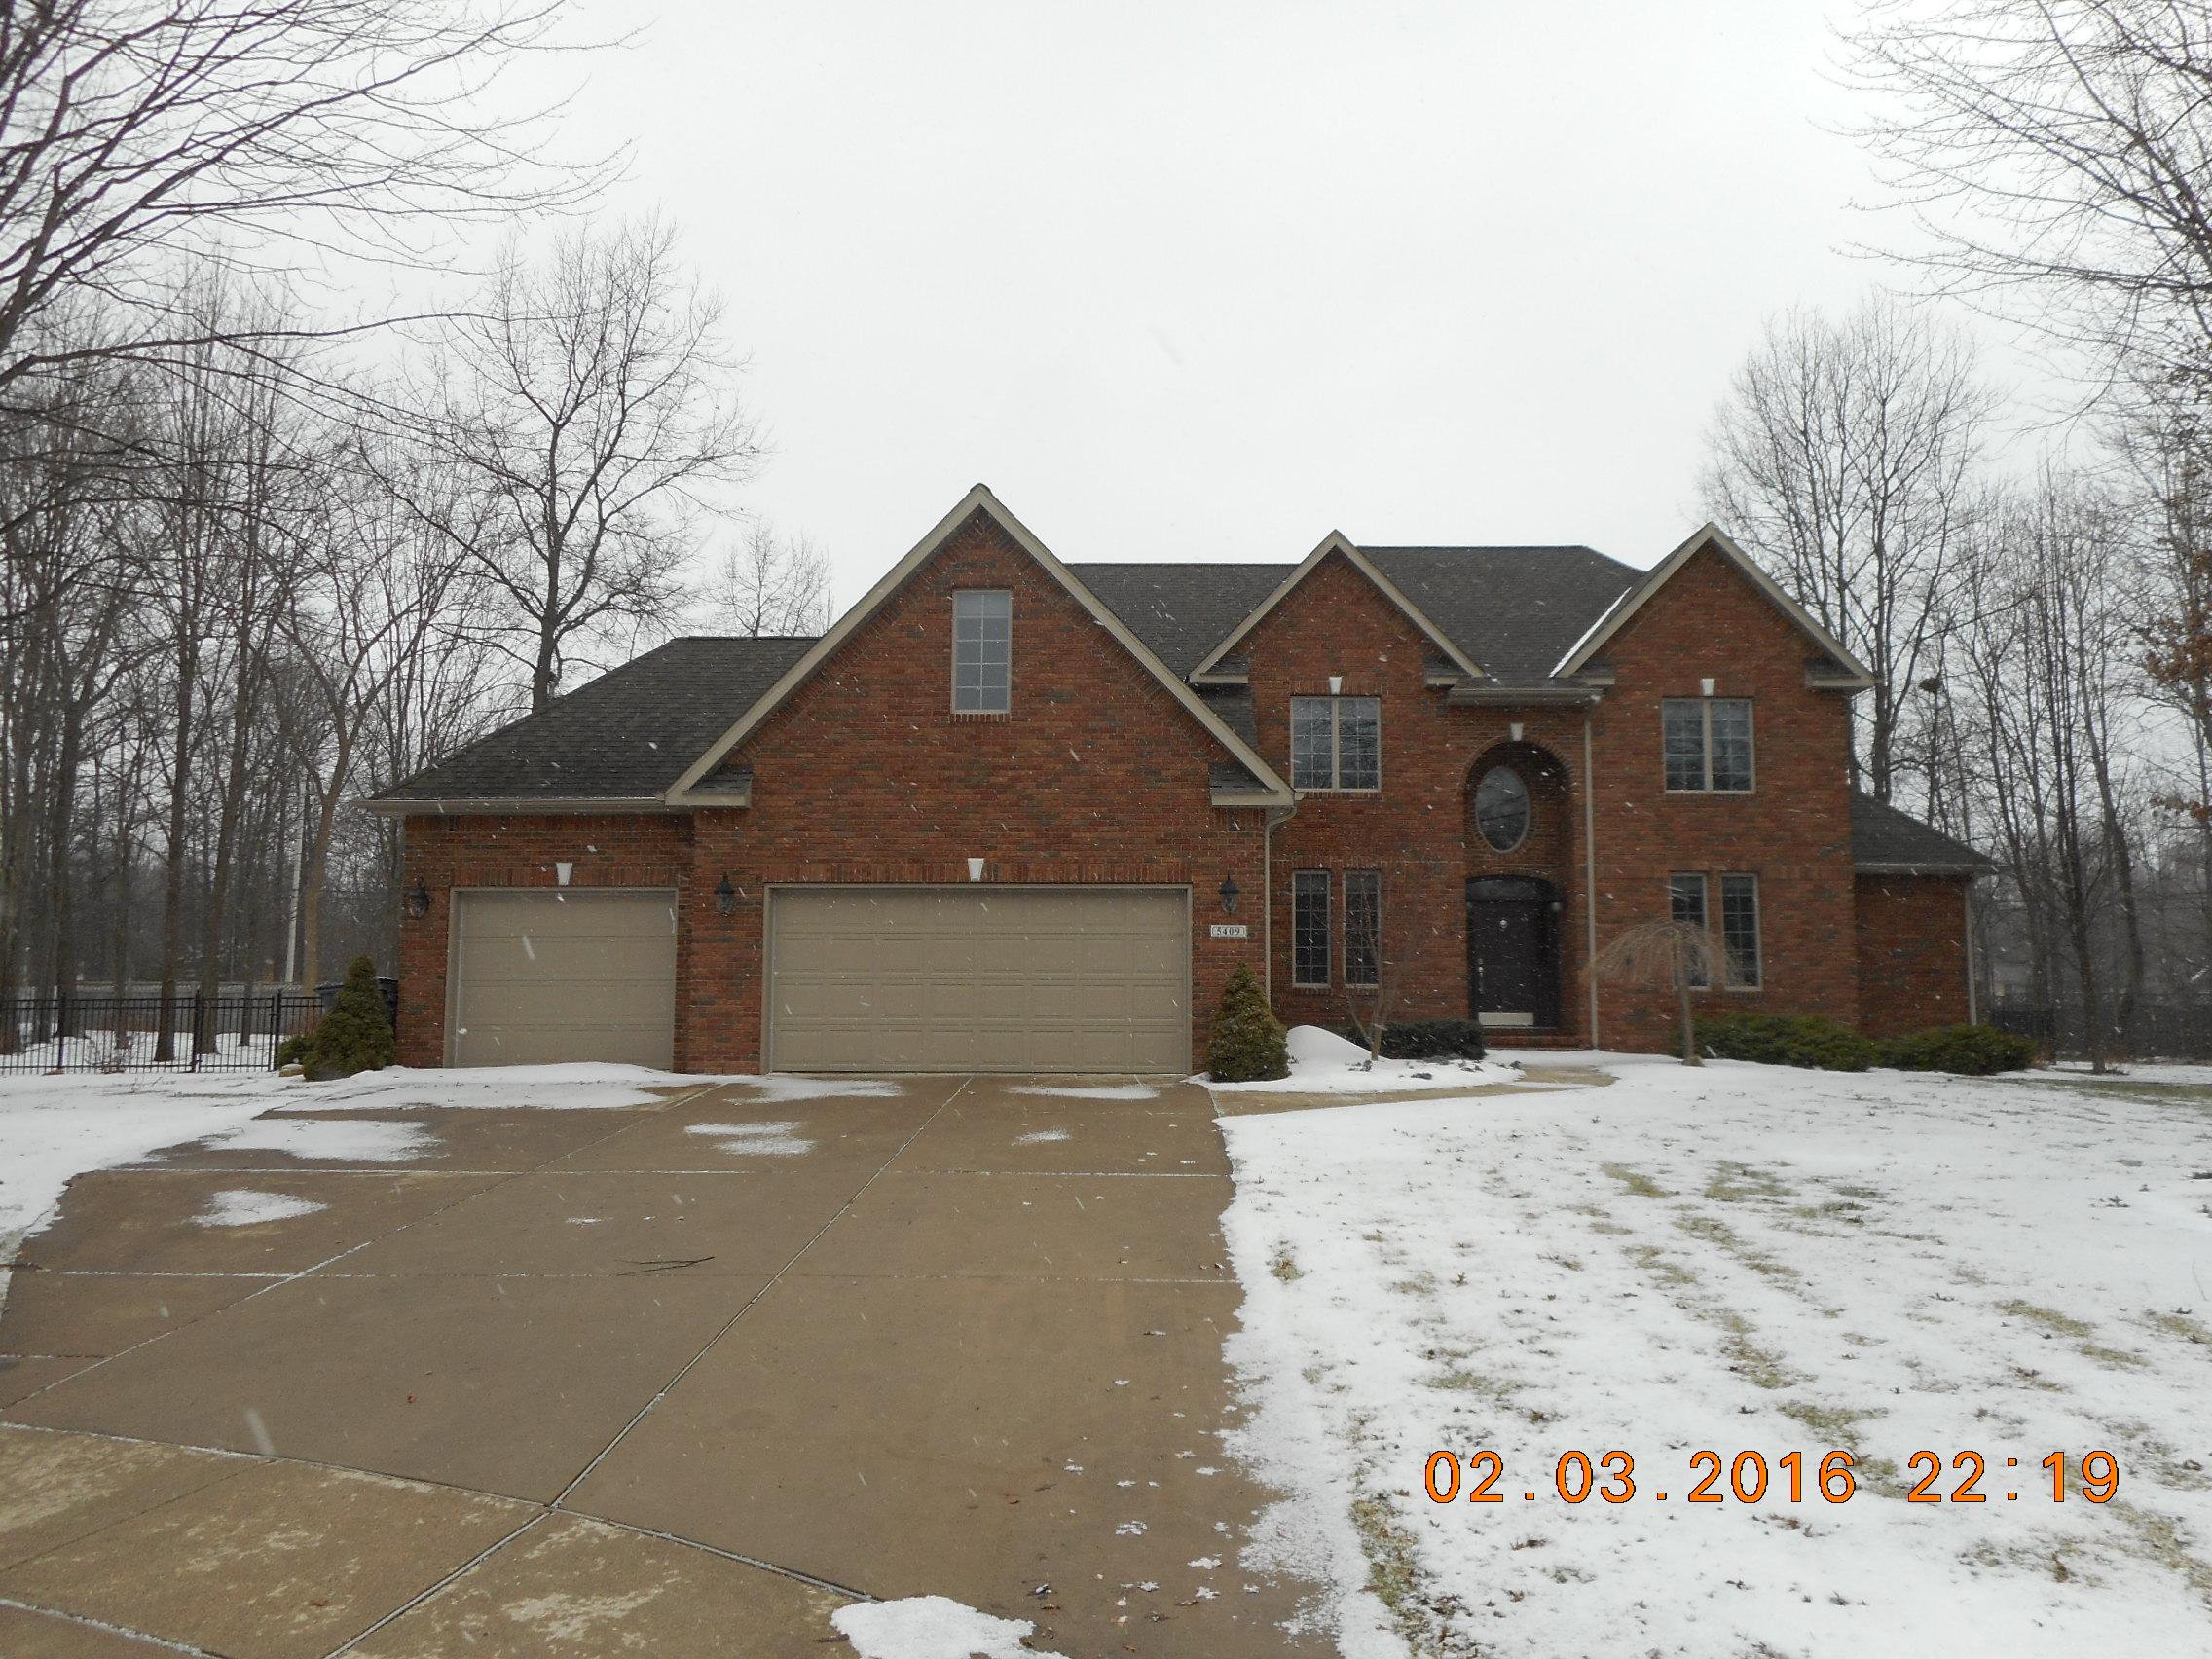 5409 Copper Creek Ct, Midland, Michigan 48640